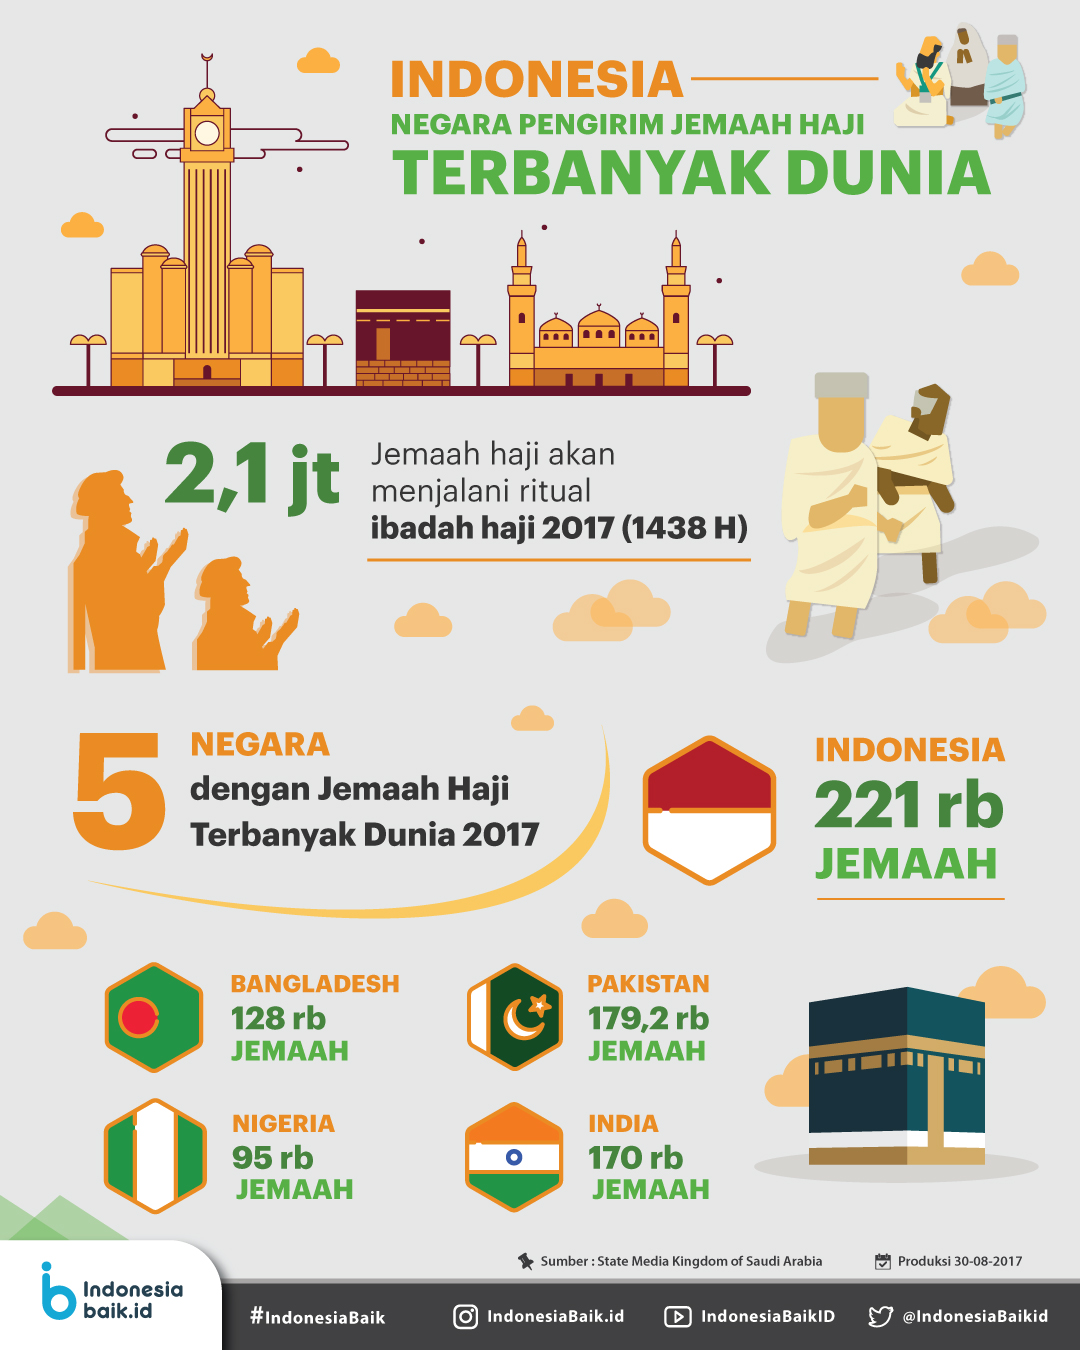 5 Negara Jumlah Jemaah Haji Terbanyak